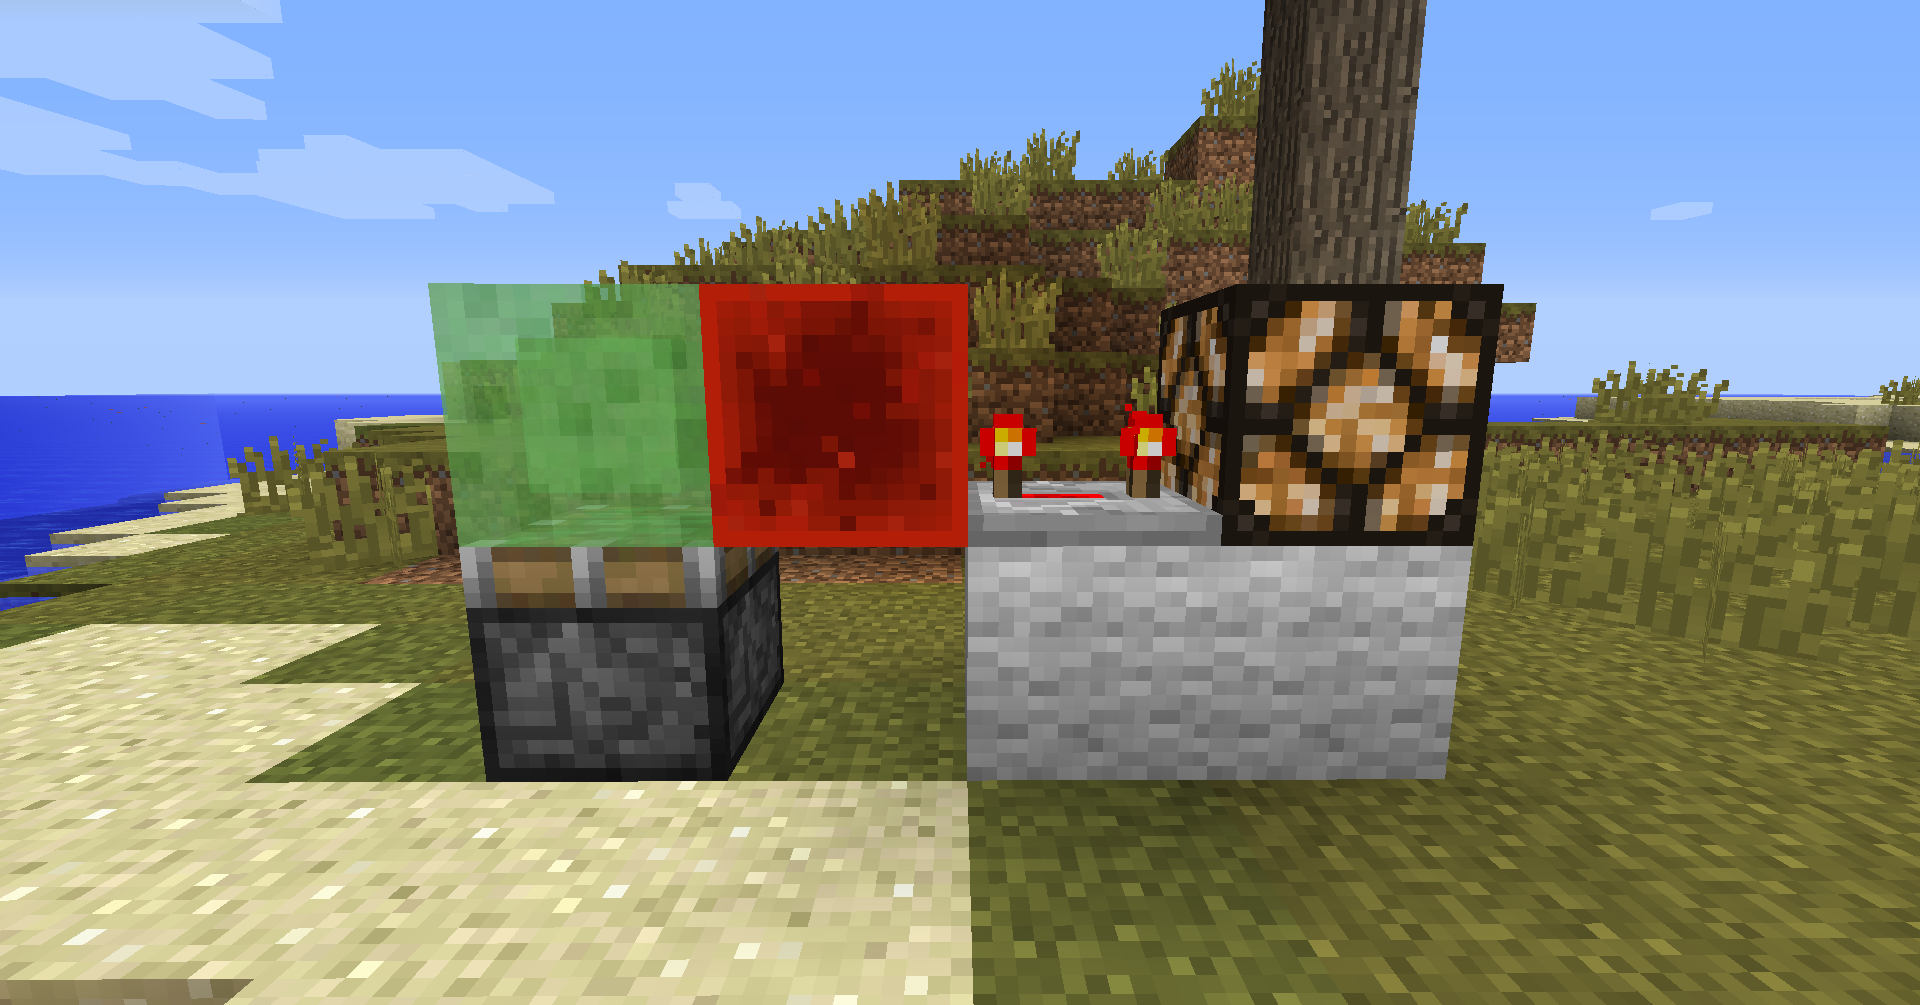 Minecraft: New Redstone Clock